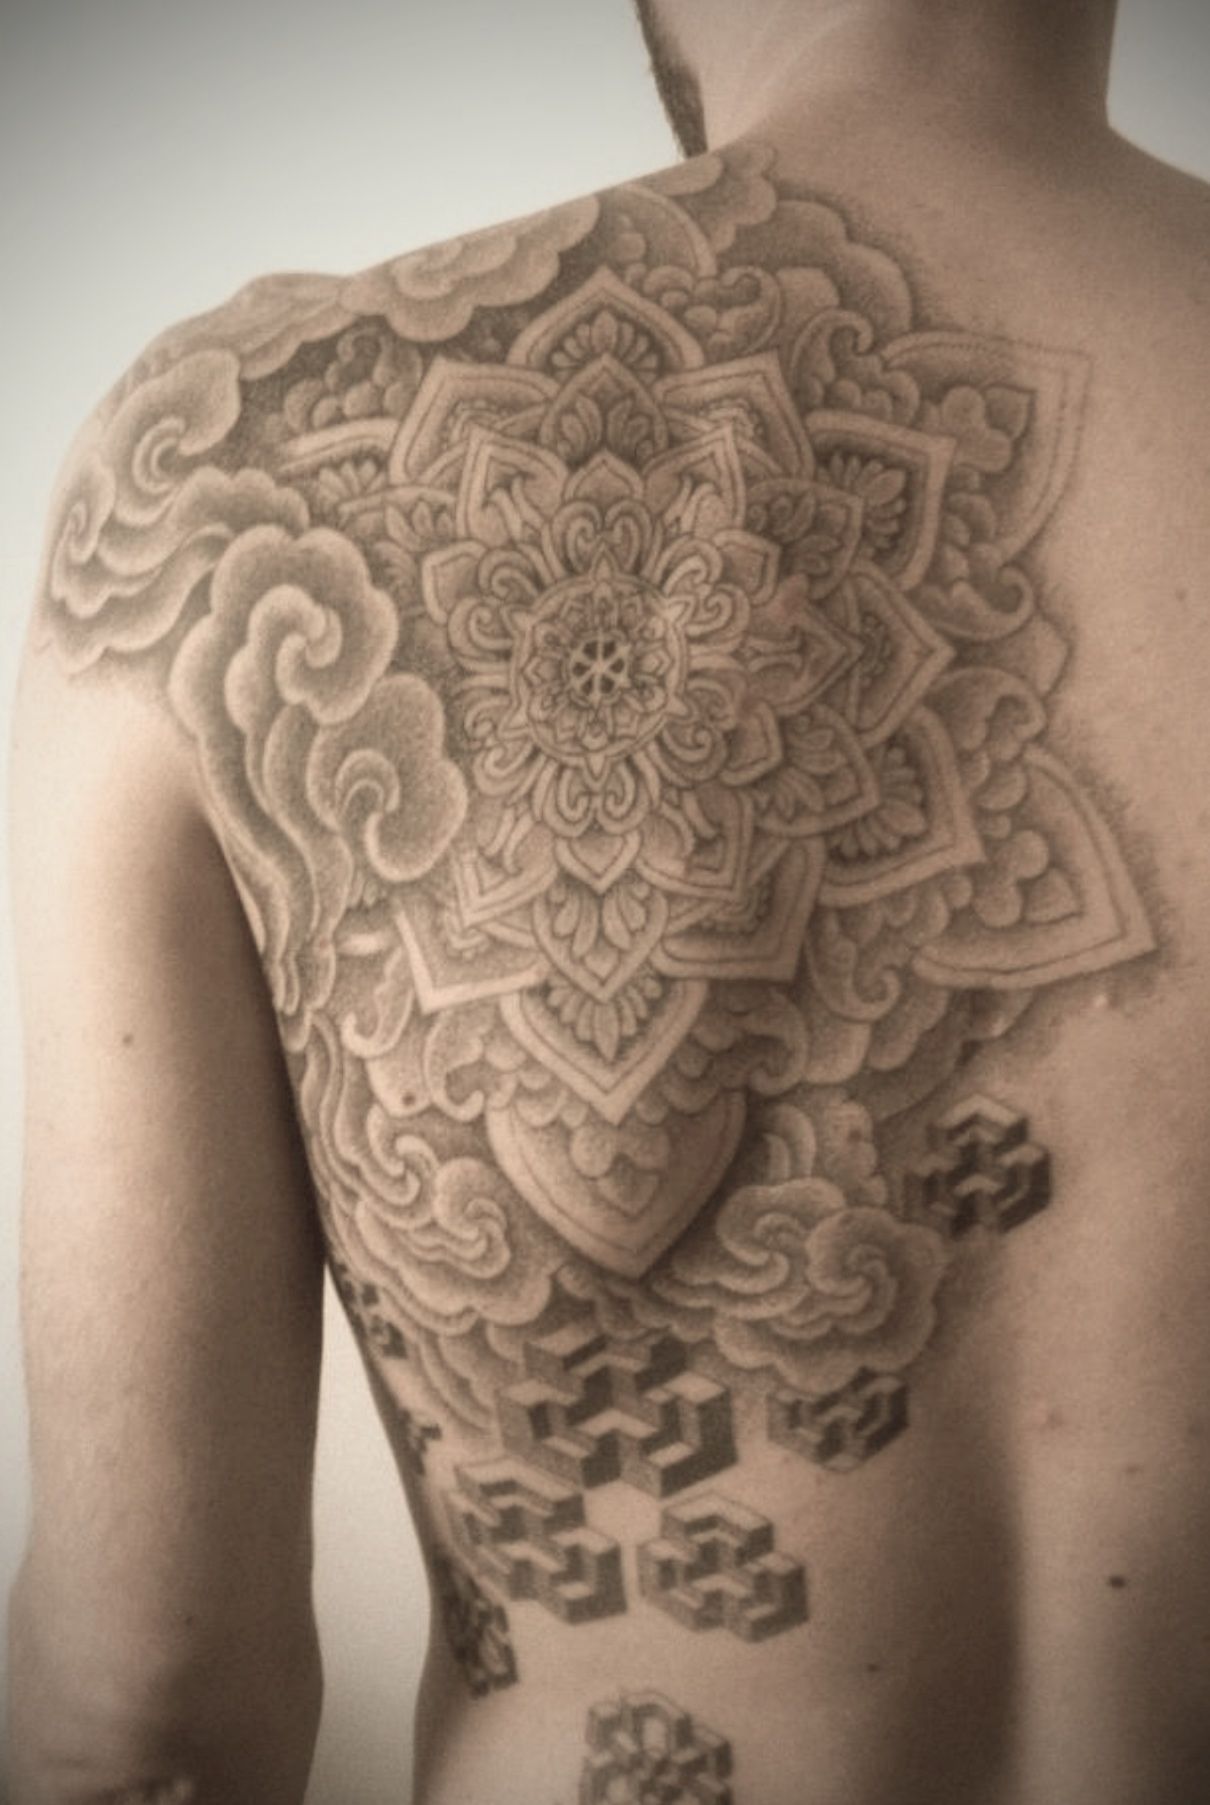 Tattoo ideas back piece tattoo ink bodyink tattoos bodyart bodymodification